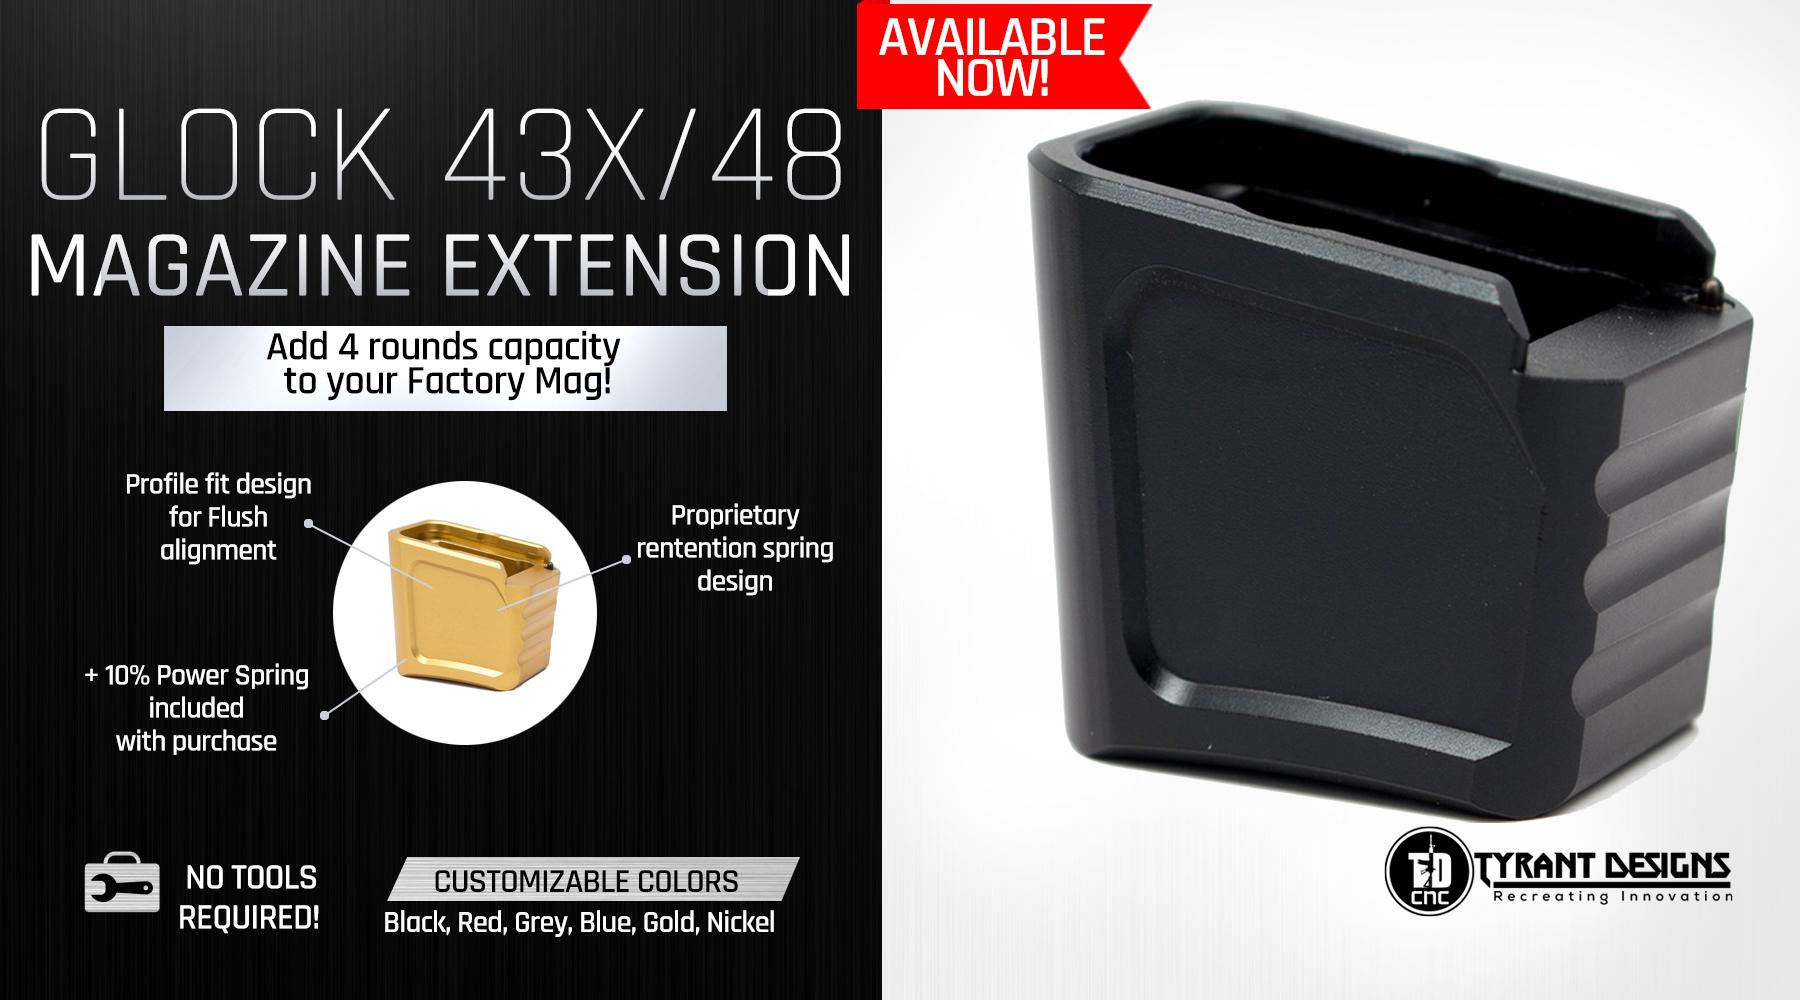 Glock Magazine Extension